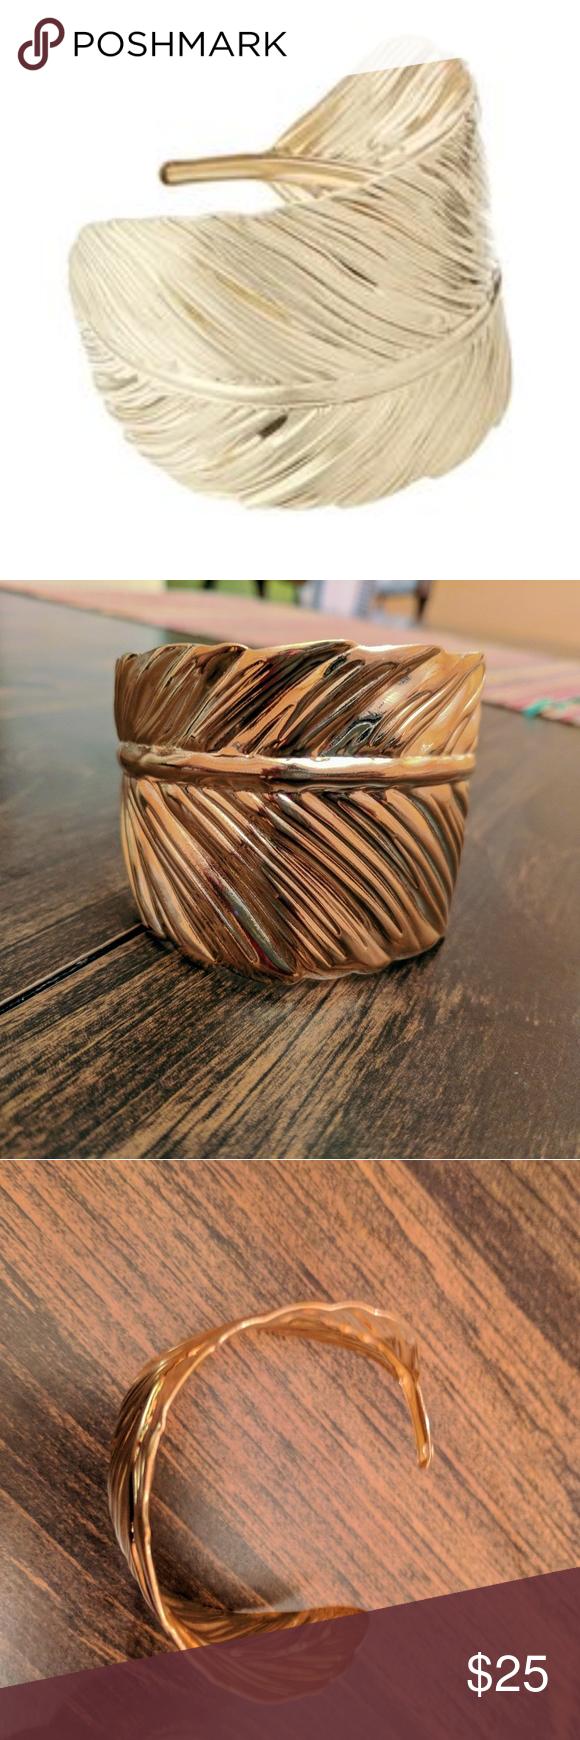 🍁Fashionable 🍁 Gold 🍁 Leaf 🍁 Cuff🍁 Adjustable Gold Leaf cuff, perfect for fall or any season! NWT, NWB. Sevil Designs Jewelry Bracelets